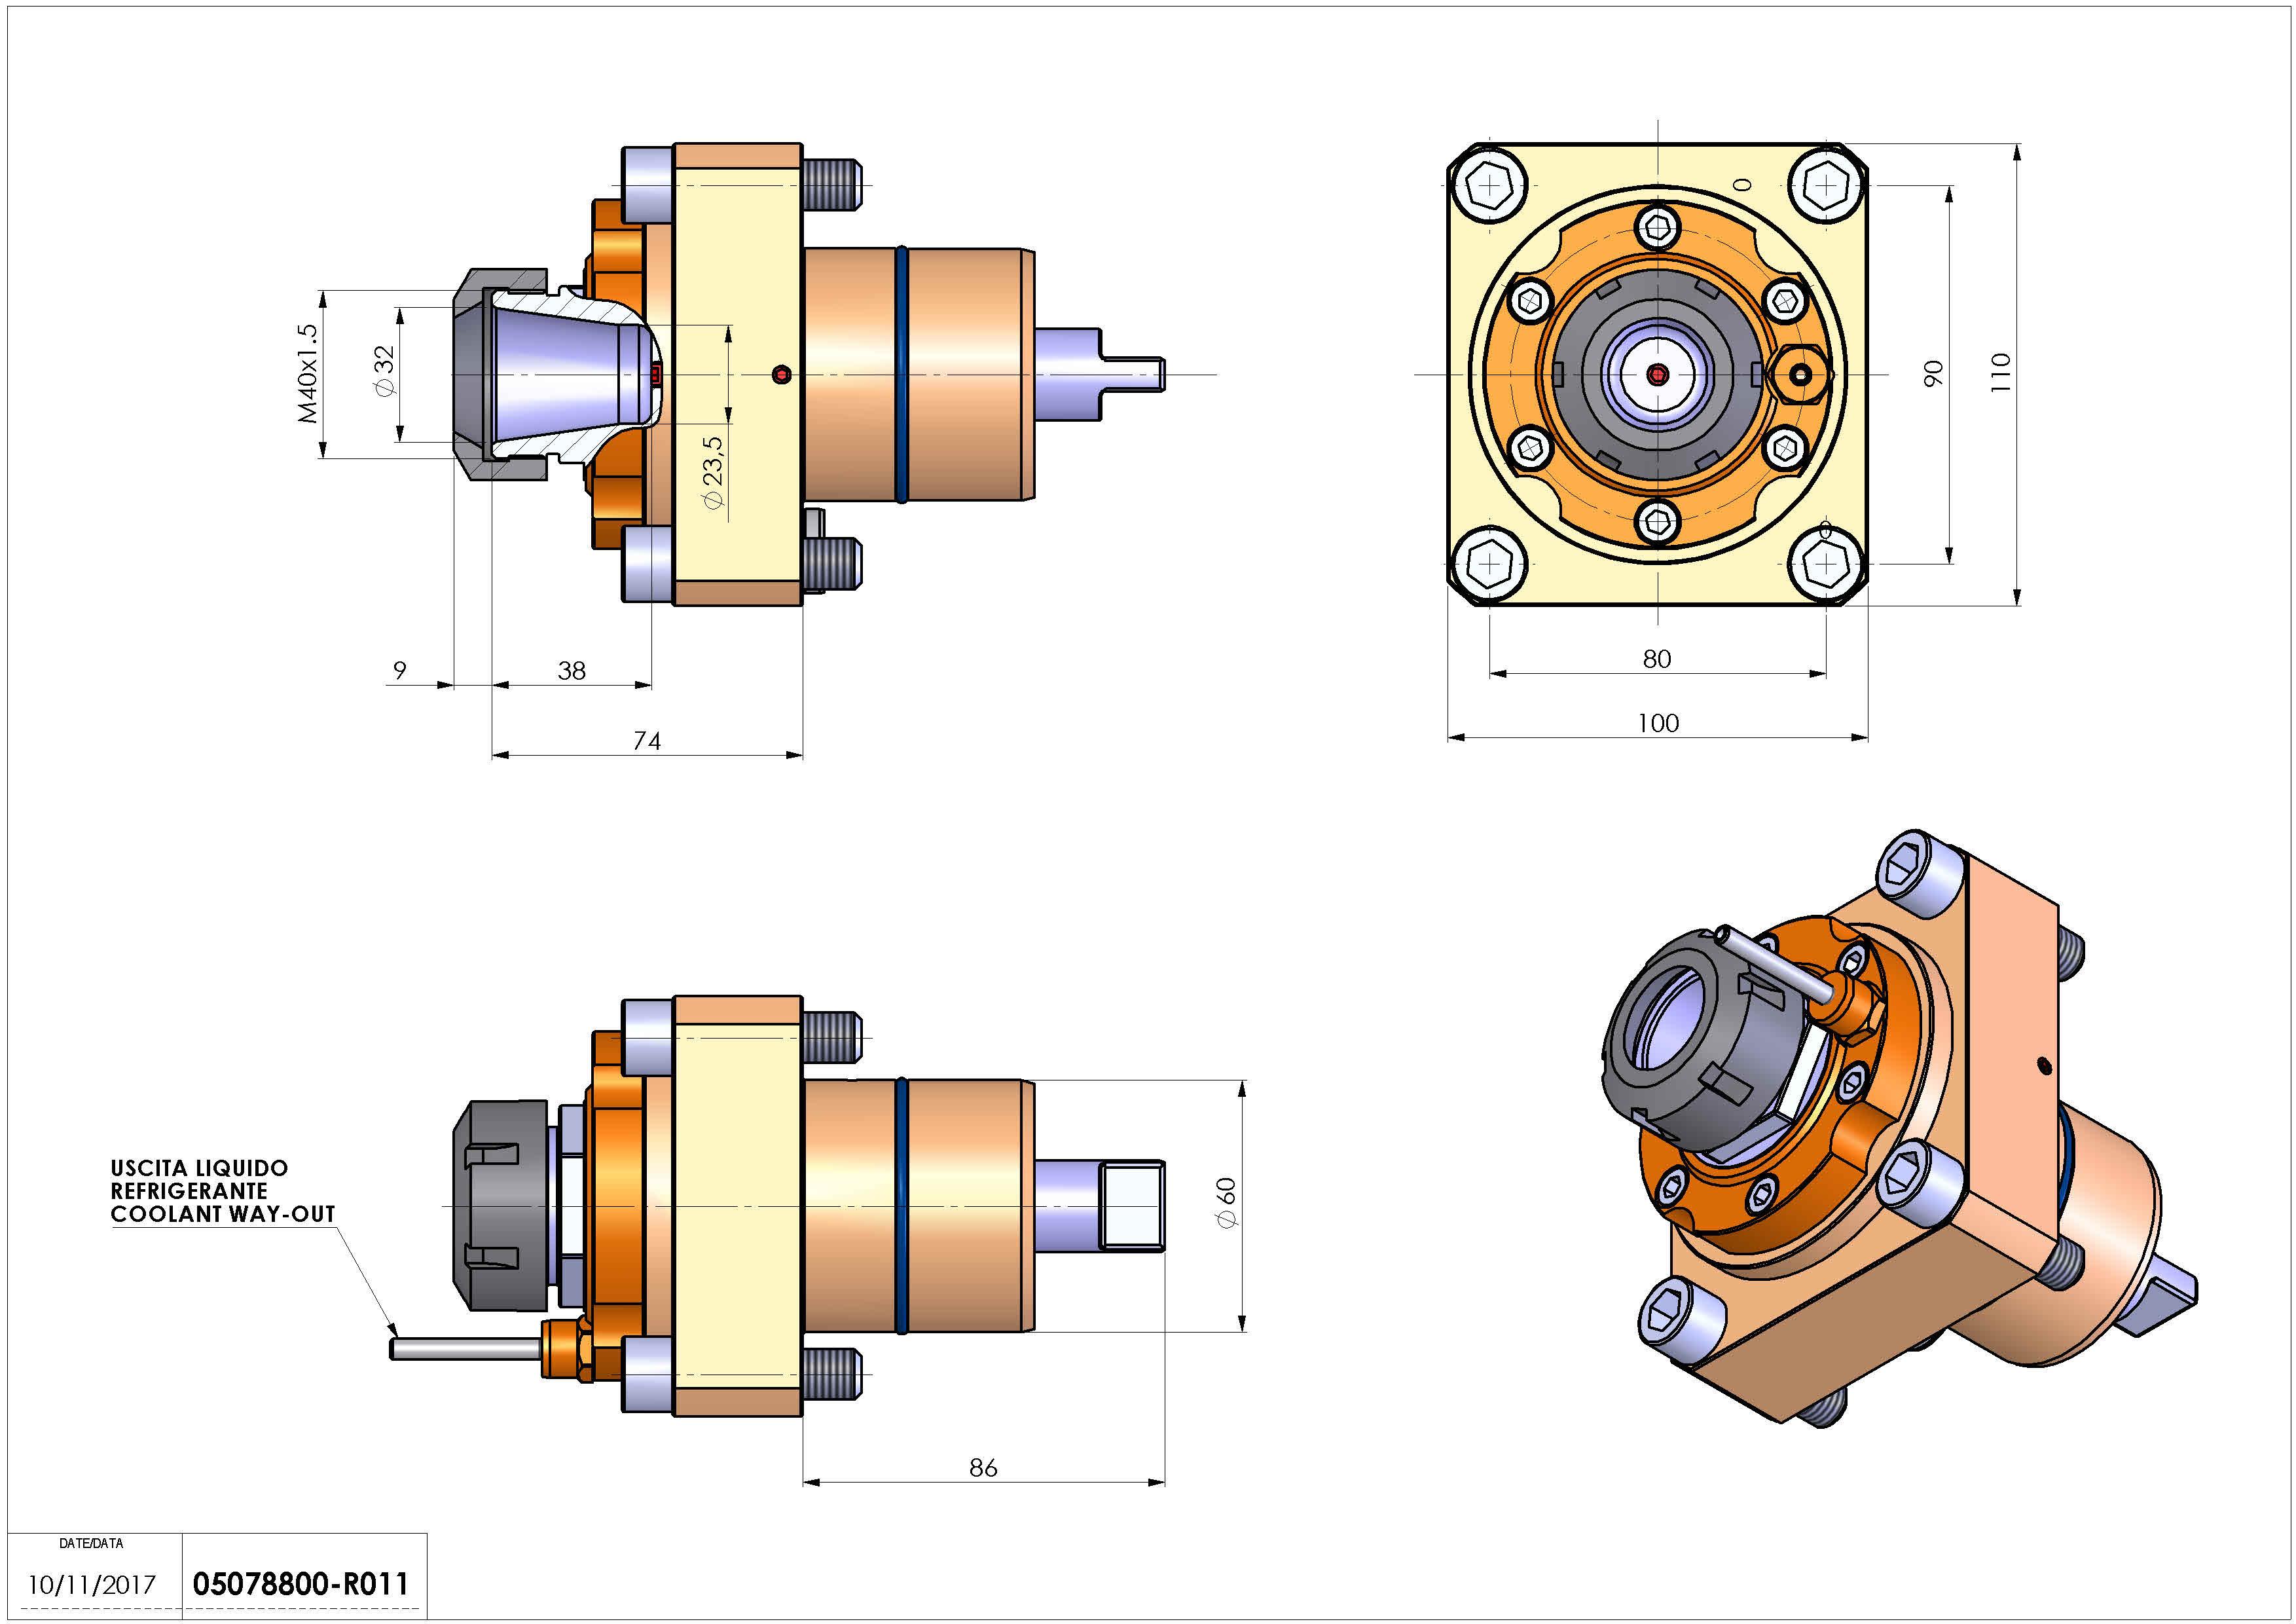 Technical image - LT-S D60 ER32 H83.